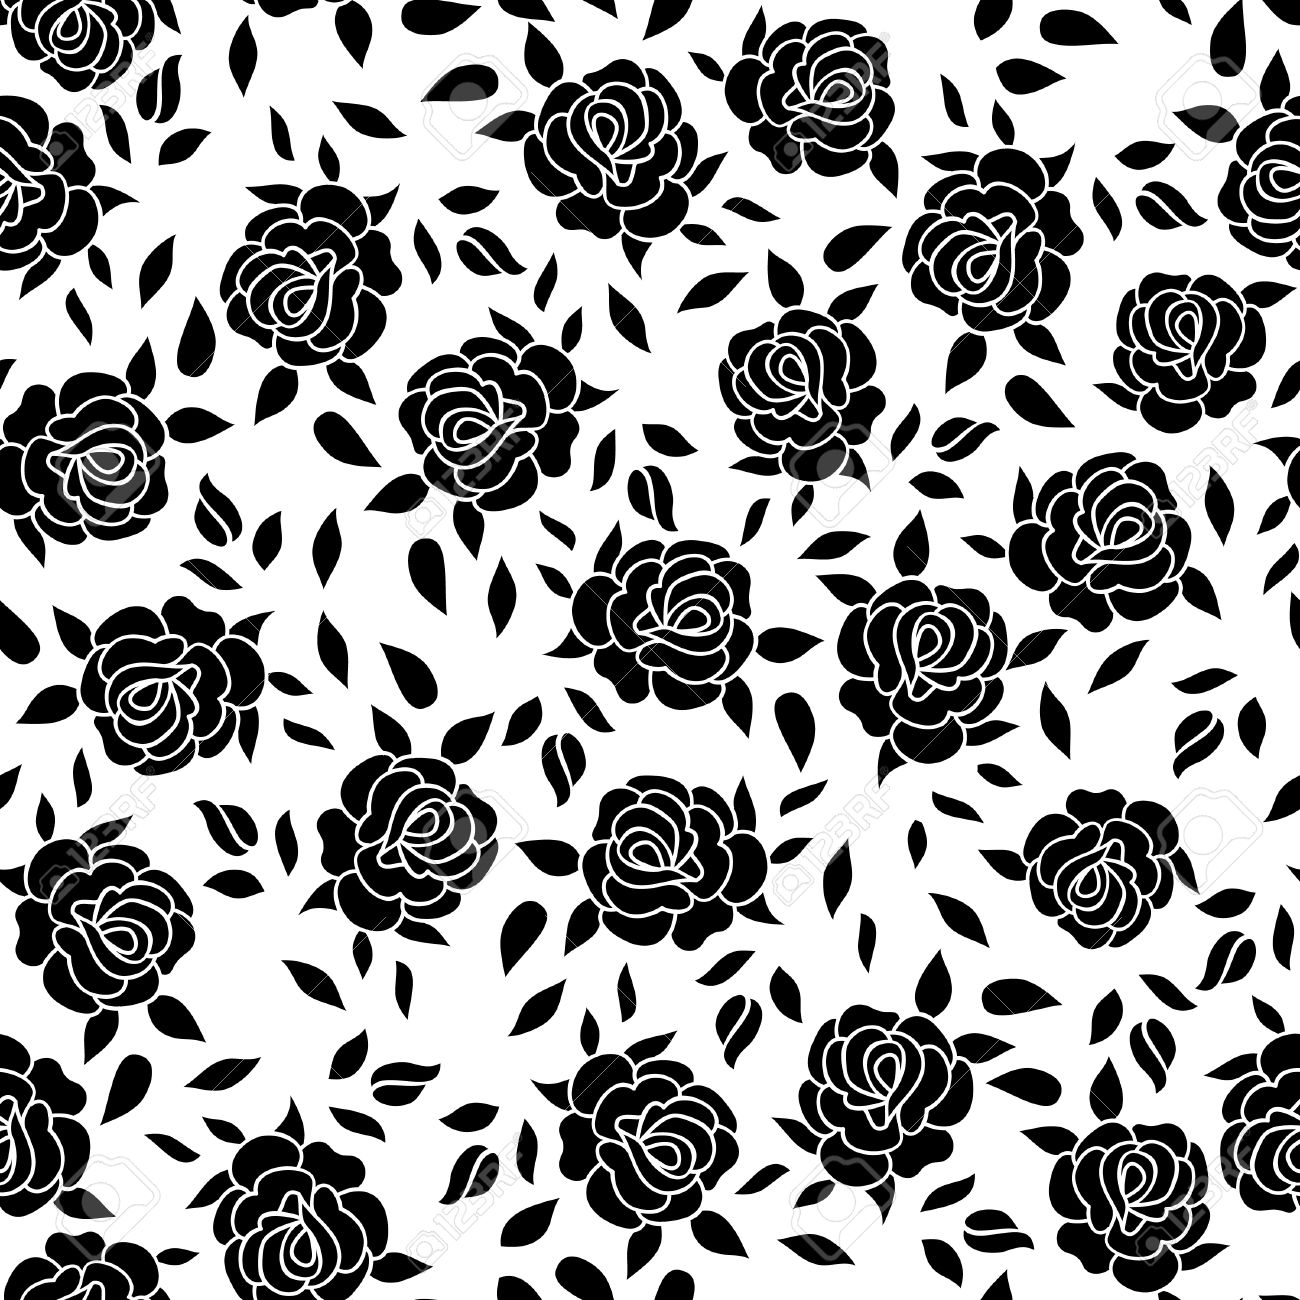 Floral Pattern Flower Rose Ornamental Background Flourish Texture